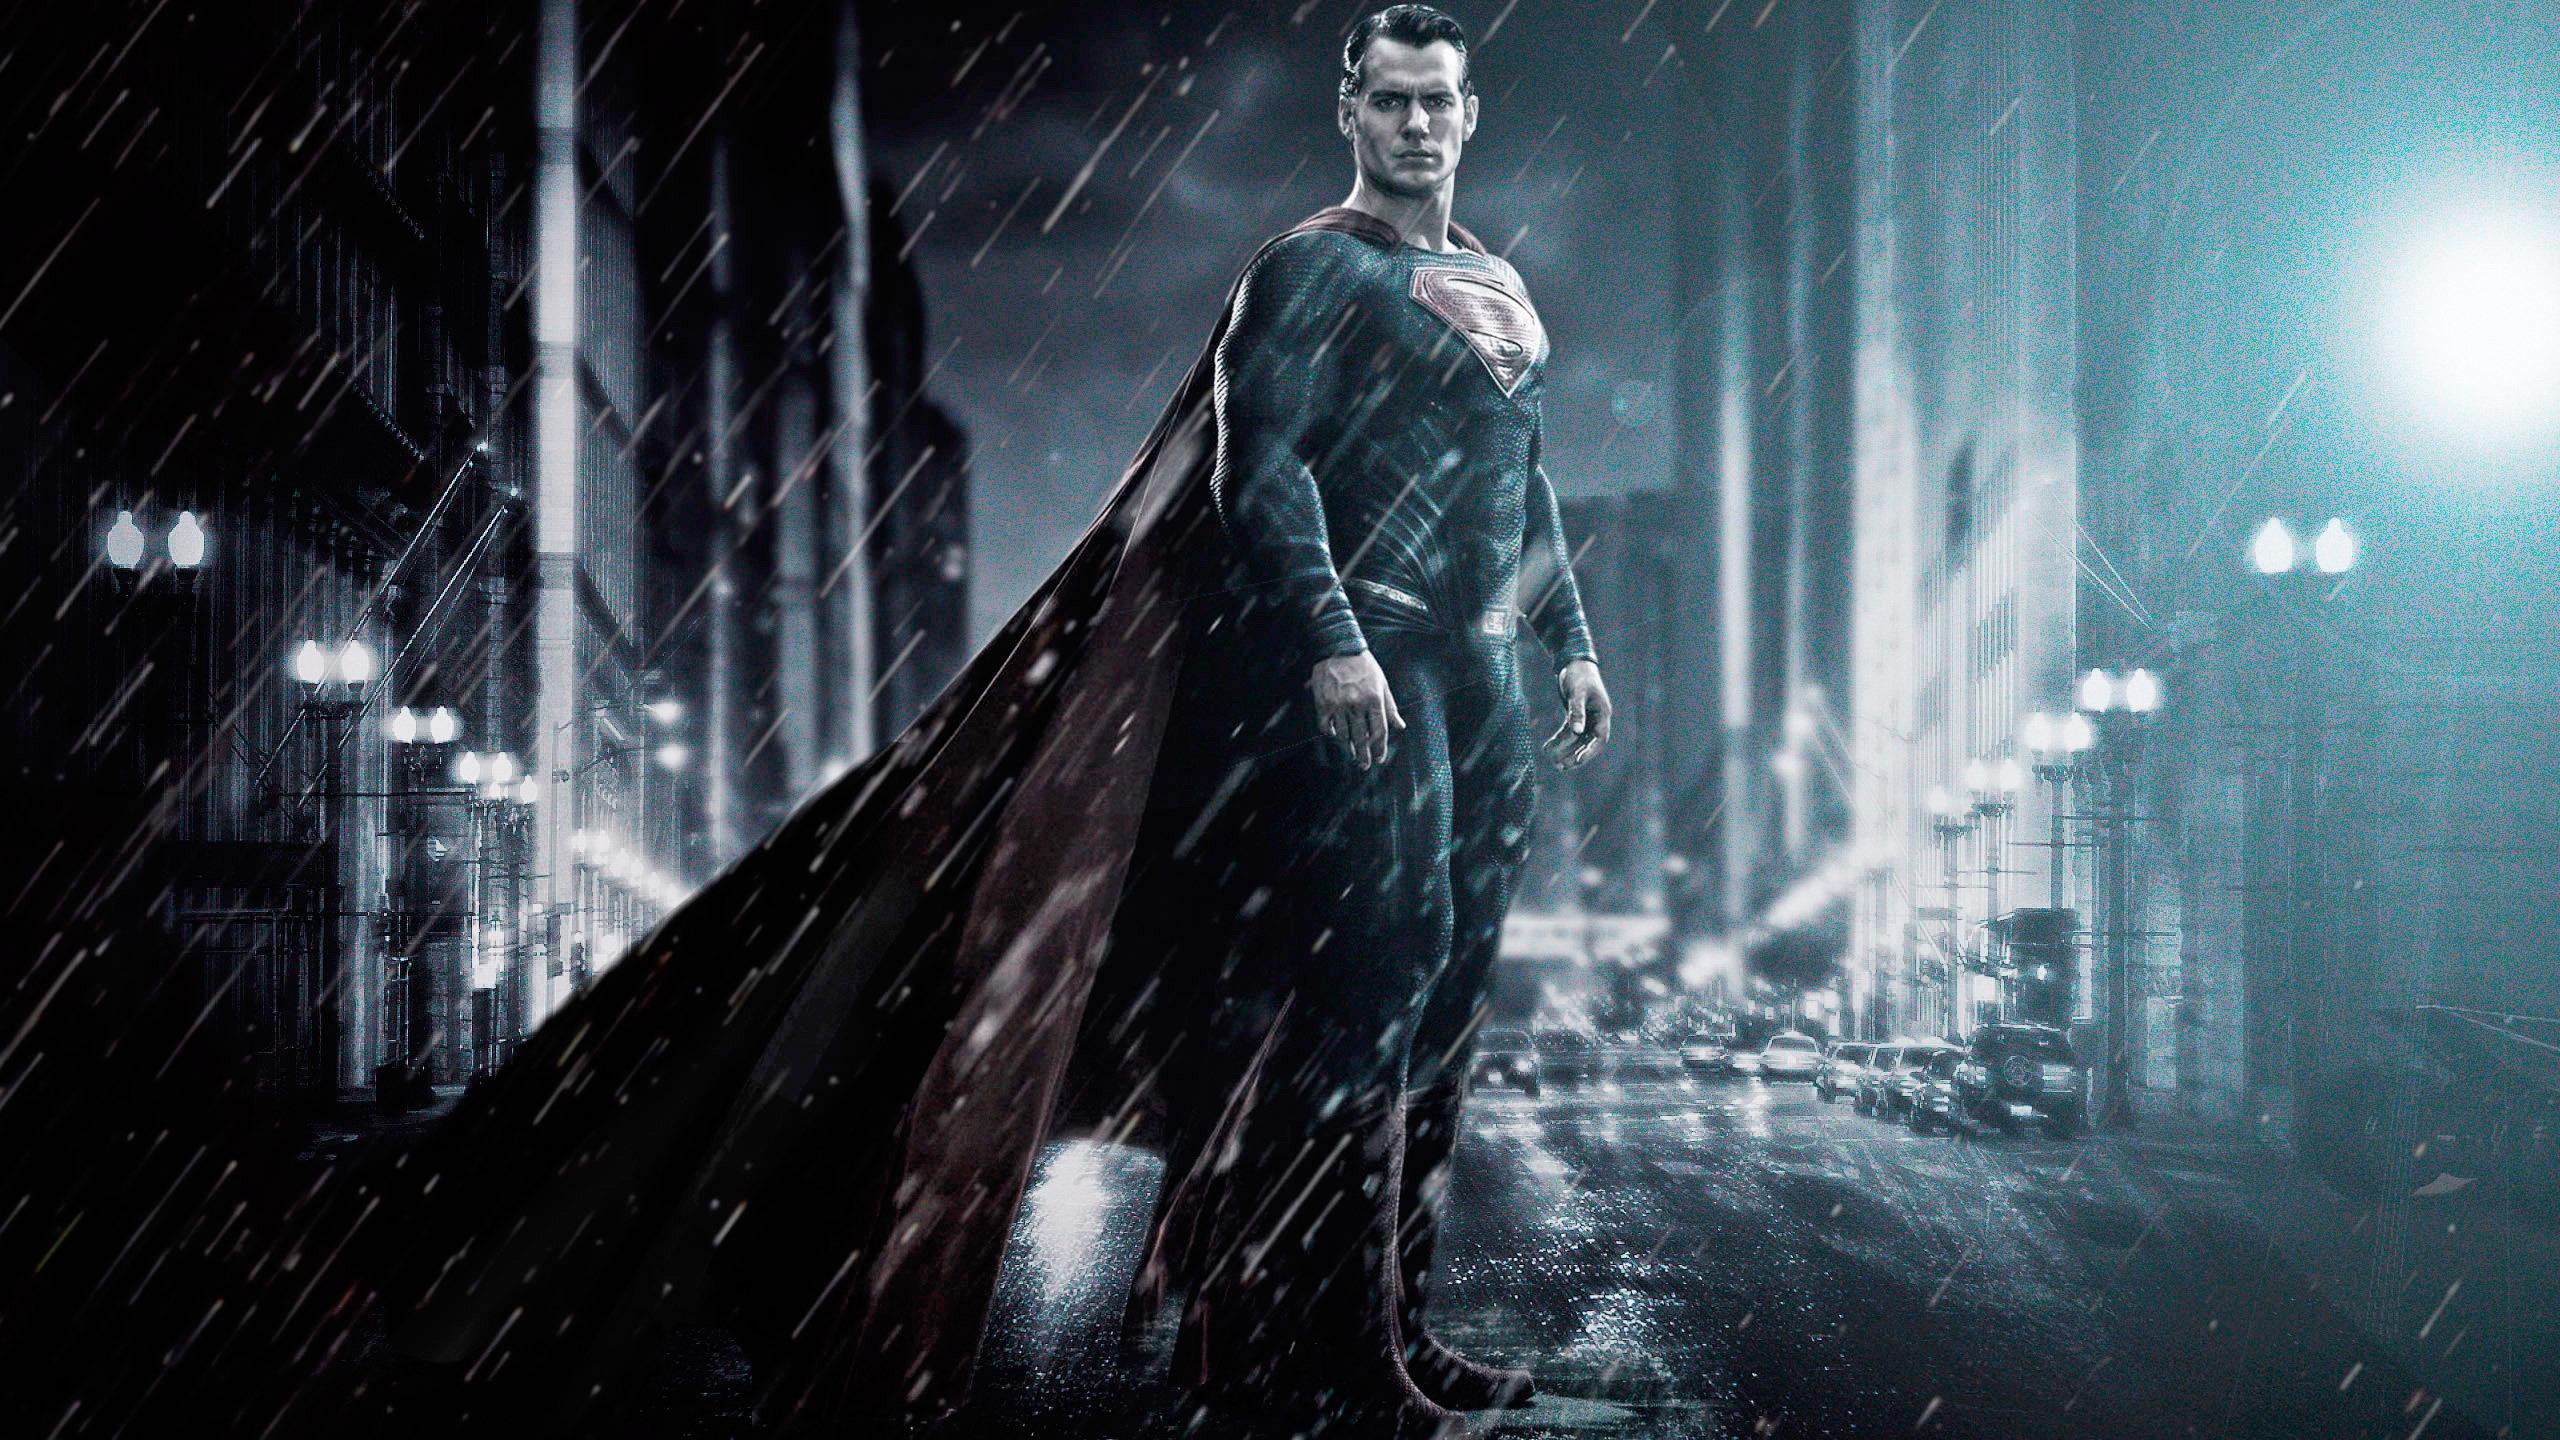 Batman Vs Superman Dawn Of Justice For Hdtv Resolution - Superman Dawn Of Justice Hd - HD Wallpaper